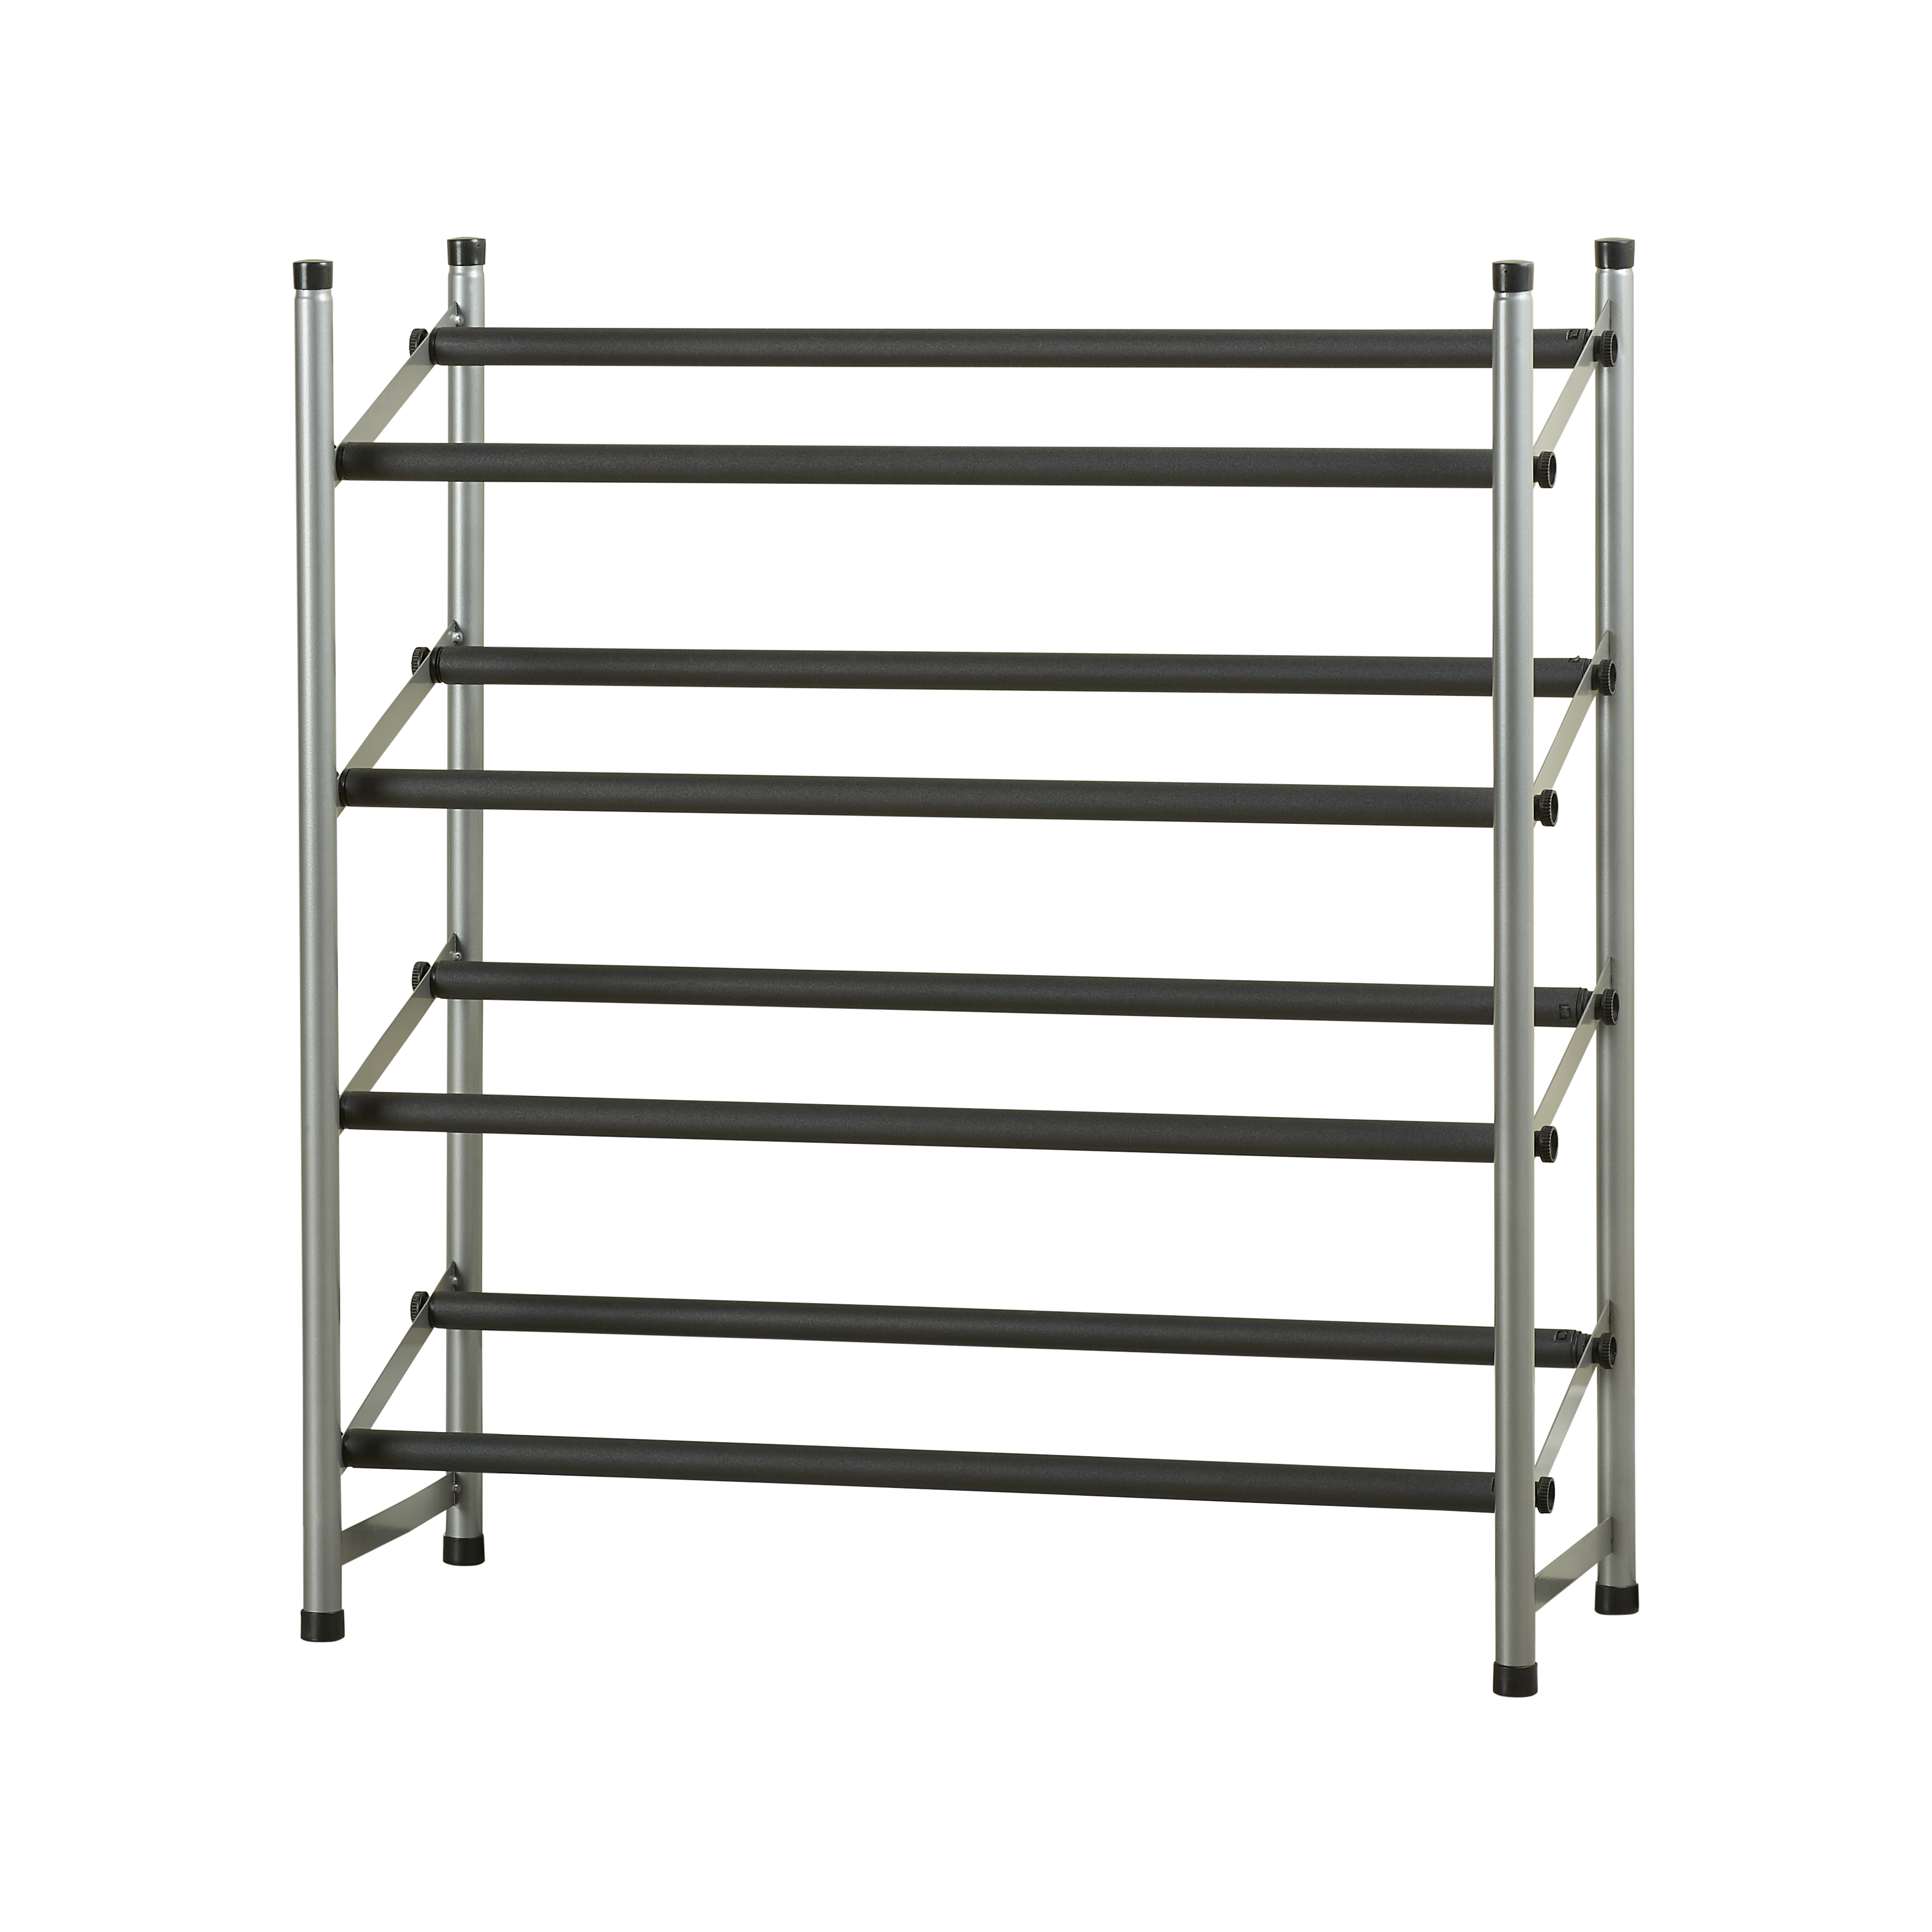 Mainstays 4-Tier Shoe Rack Storage Organizer